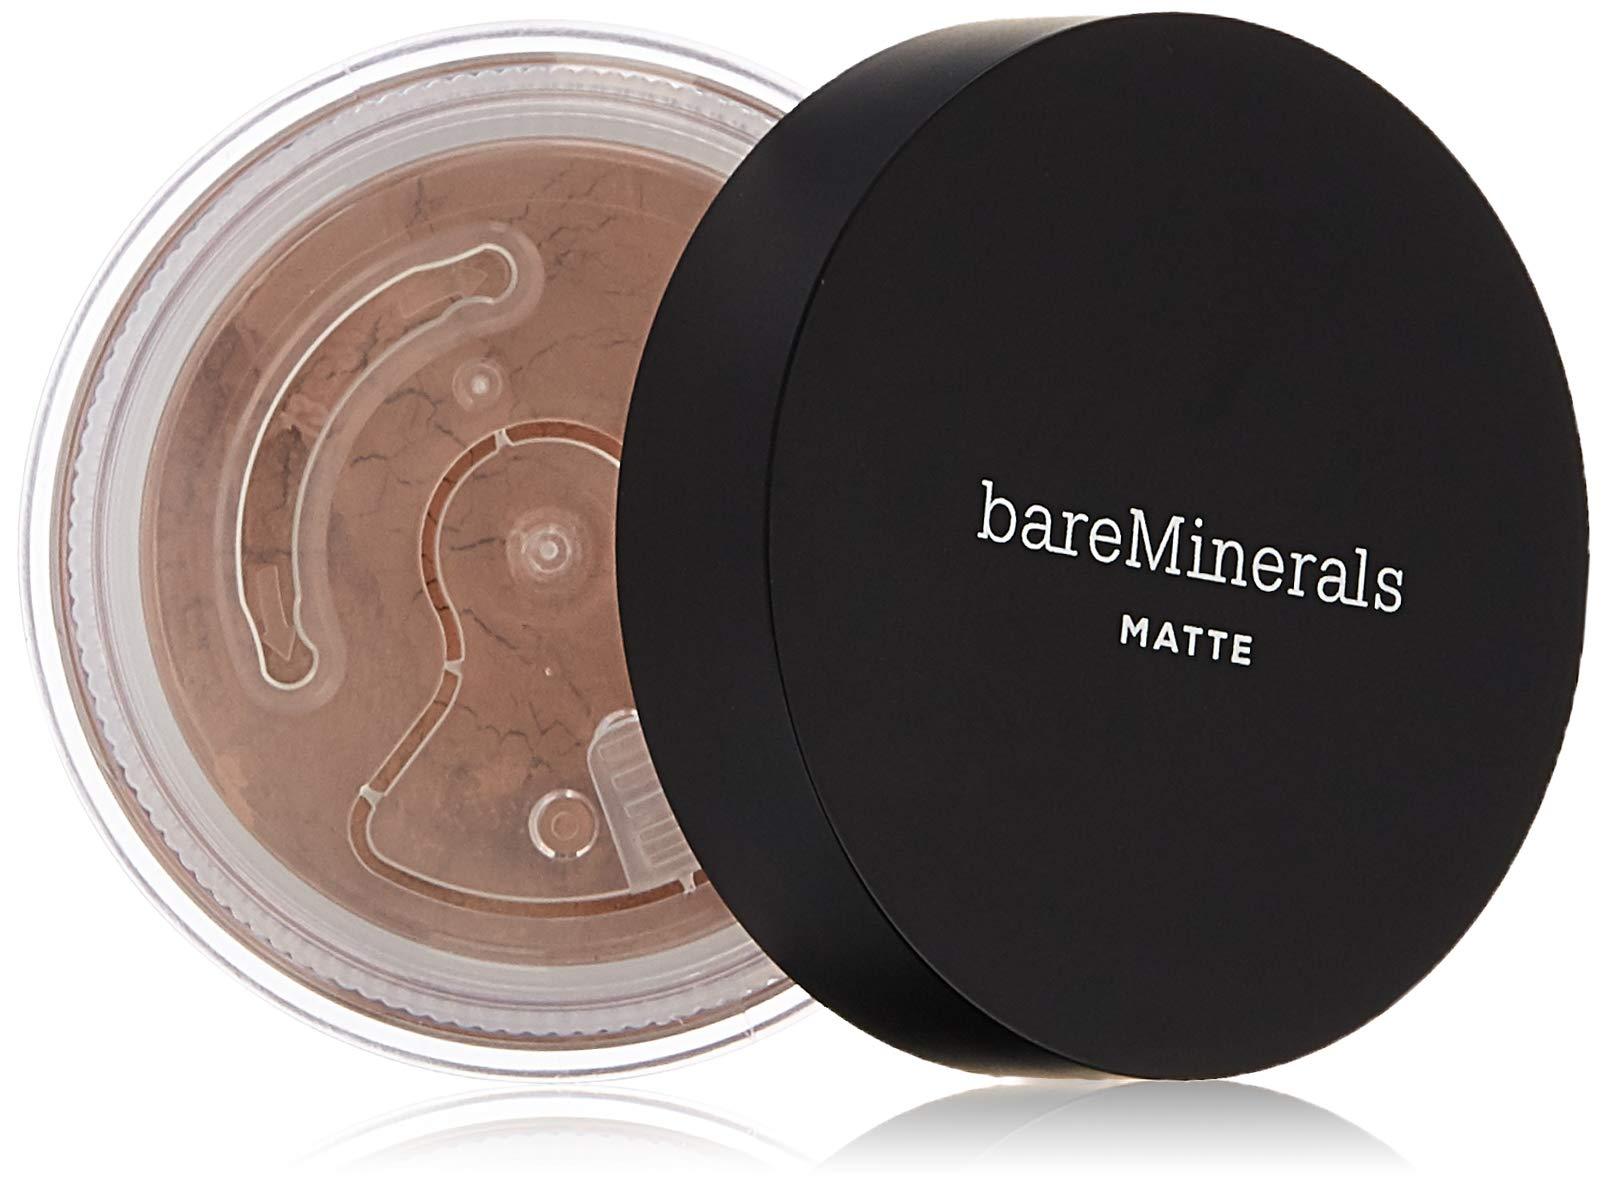 bareMinerals Original Broad Spectrum SPF 15 Foundation, Medium Tan, 0.28 Ounce by bare Minerals